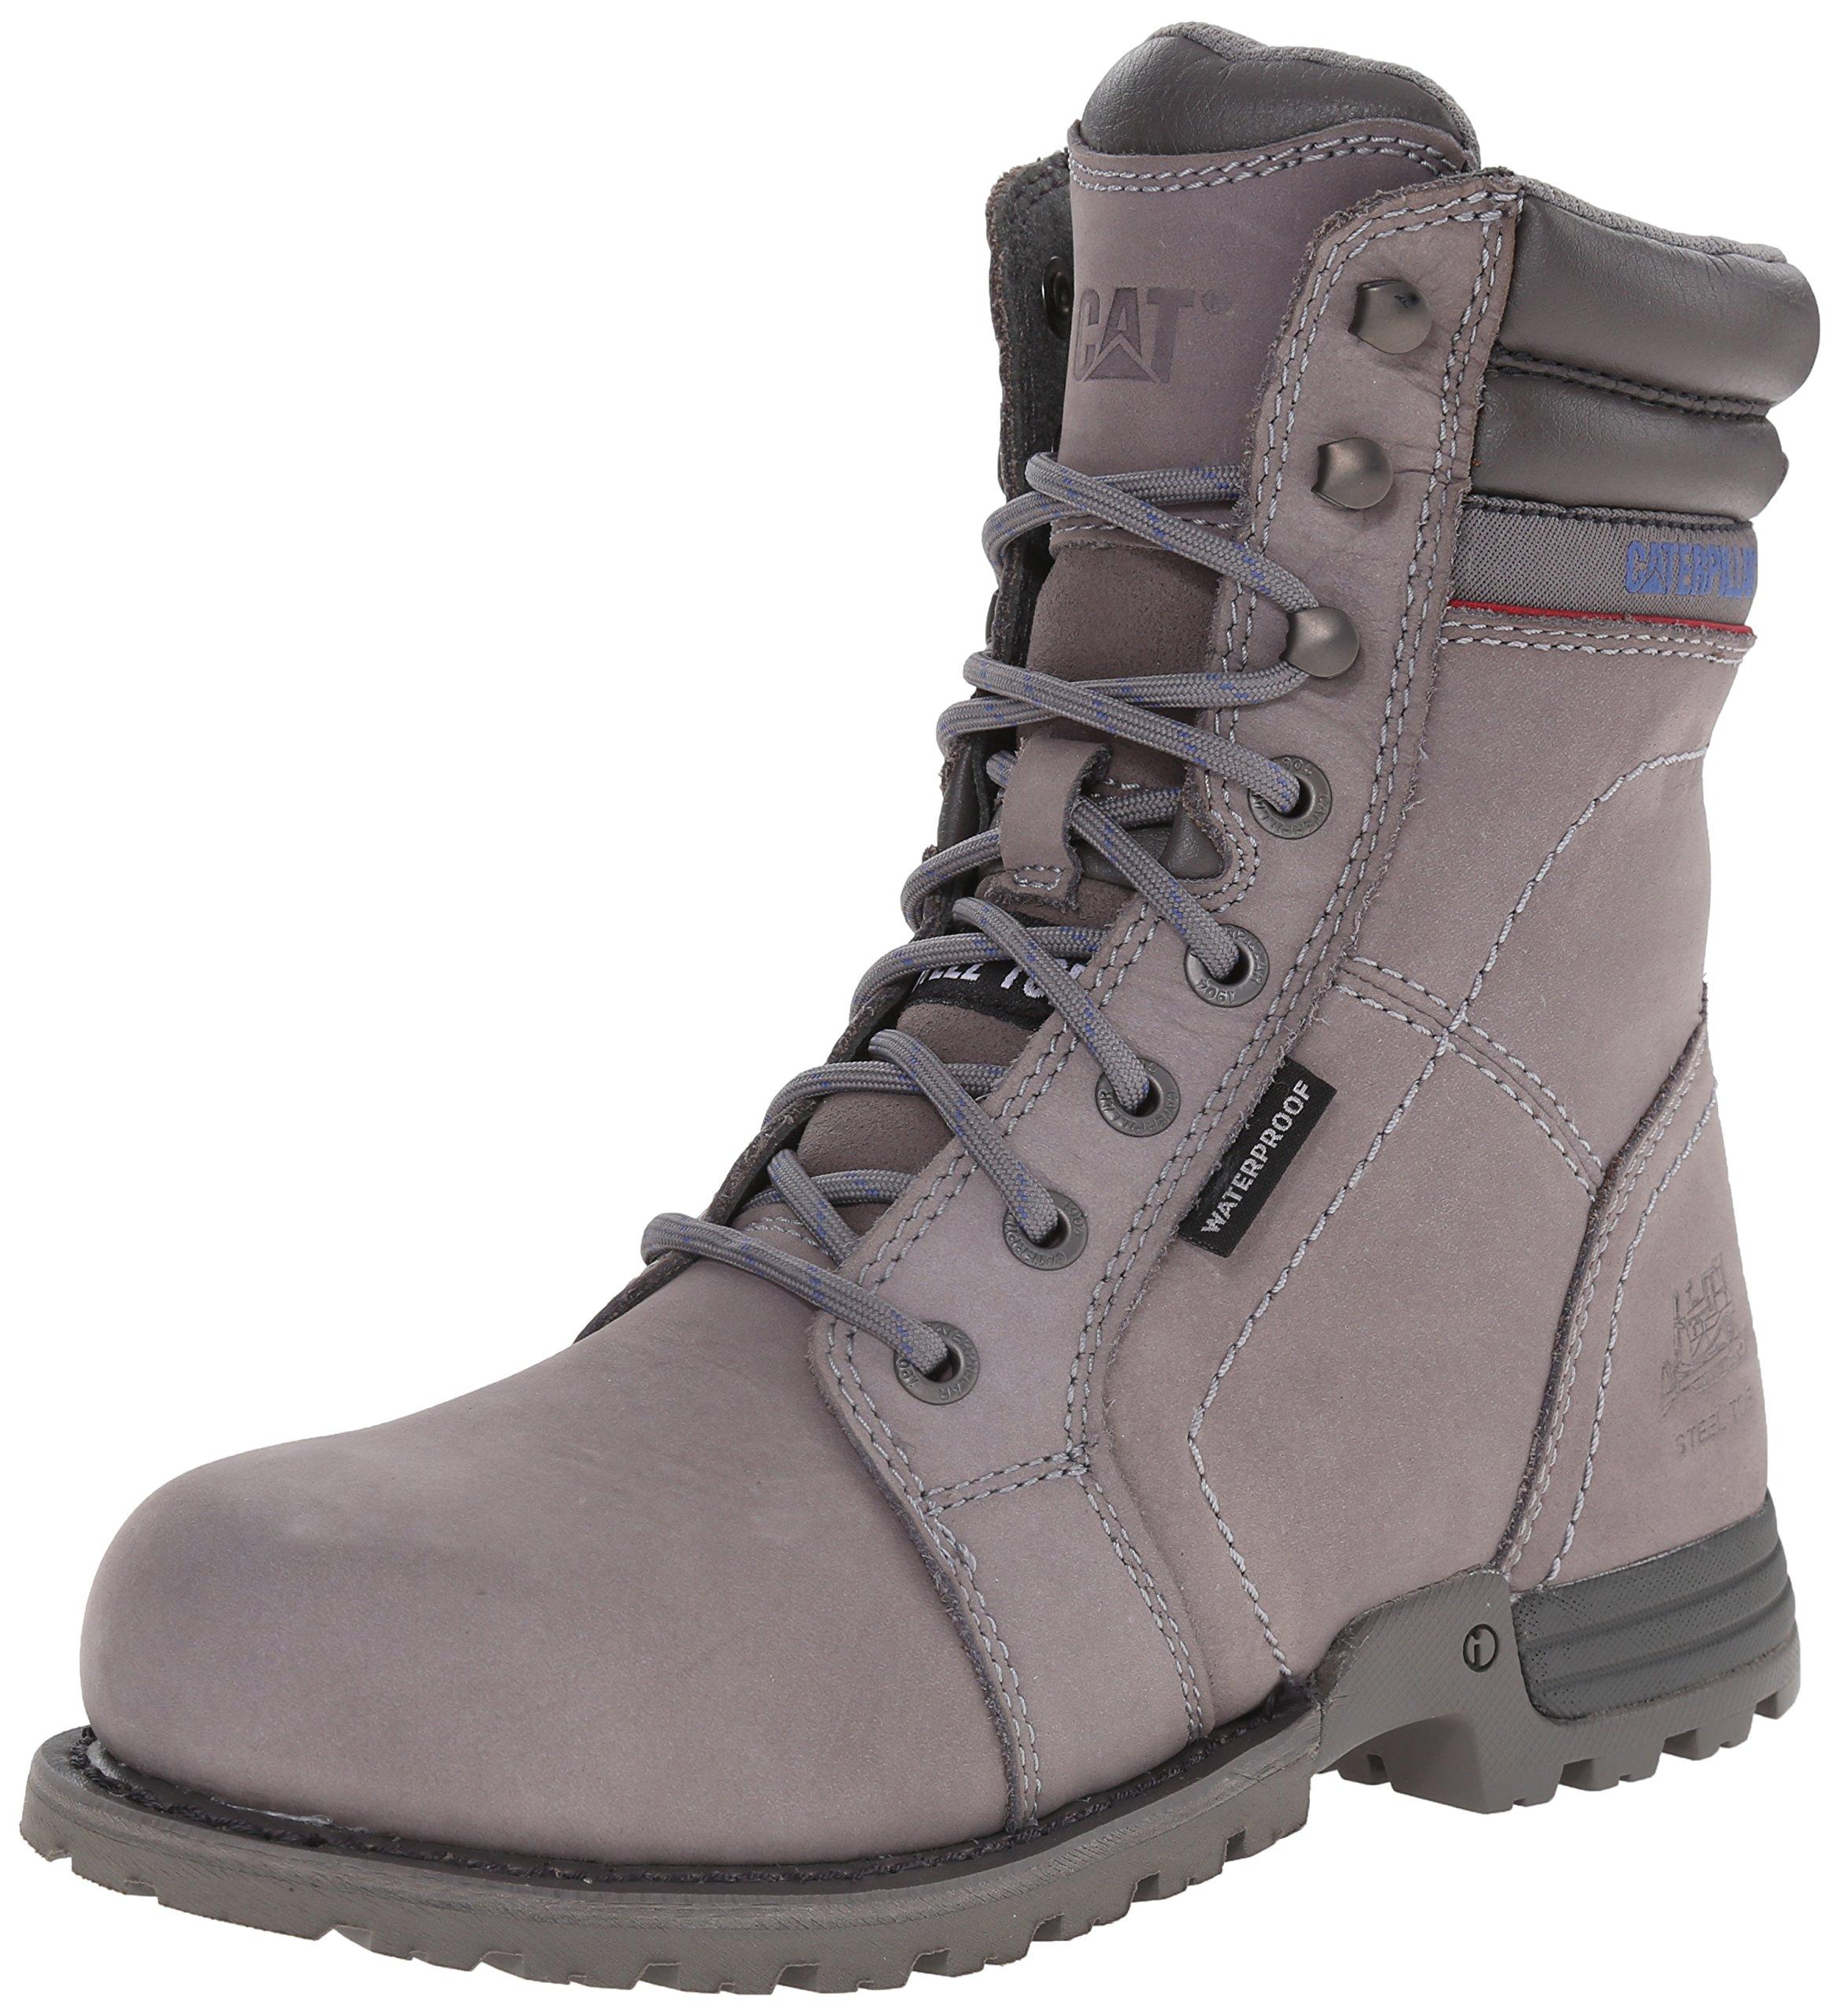 Caterpillar Women's Echo Waterproof Steel Toe Work Boot, Frost Grey, 7.5 M US